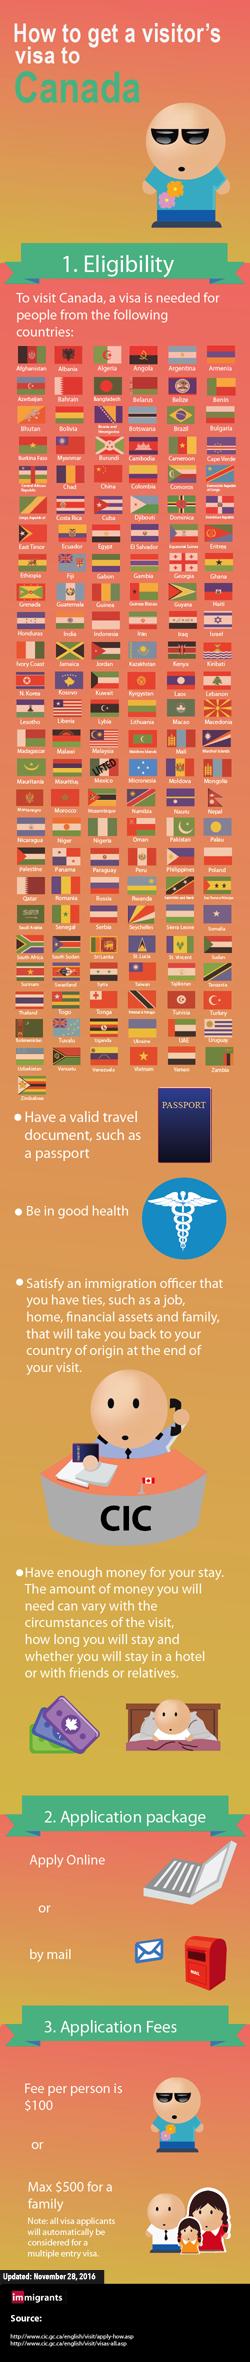 Visitor Visa Canada Infographic